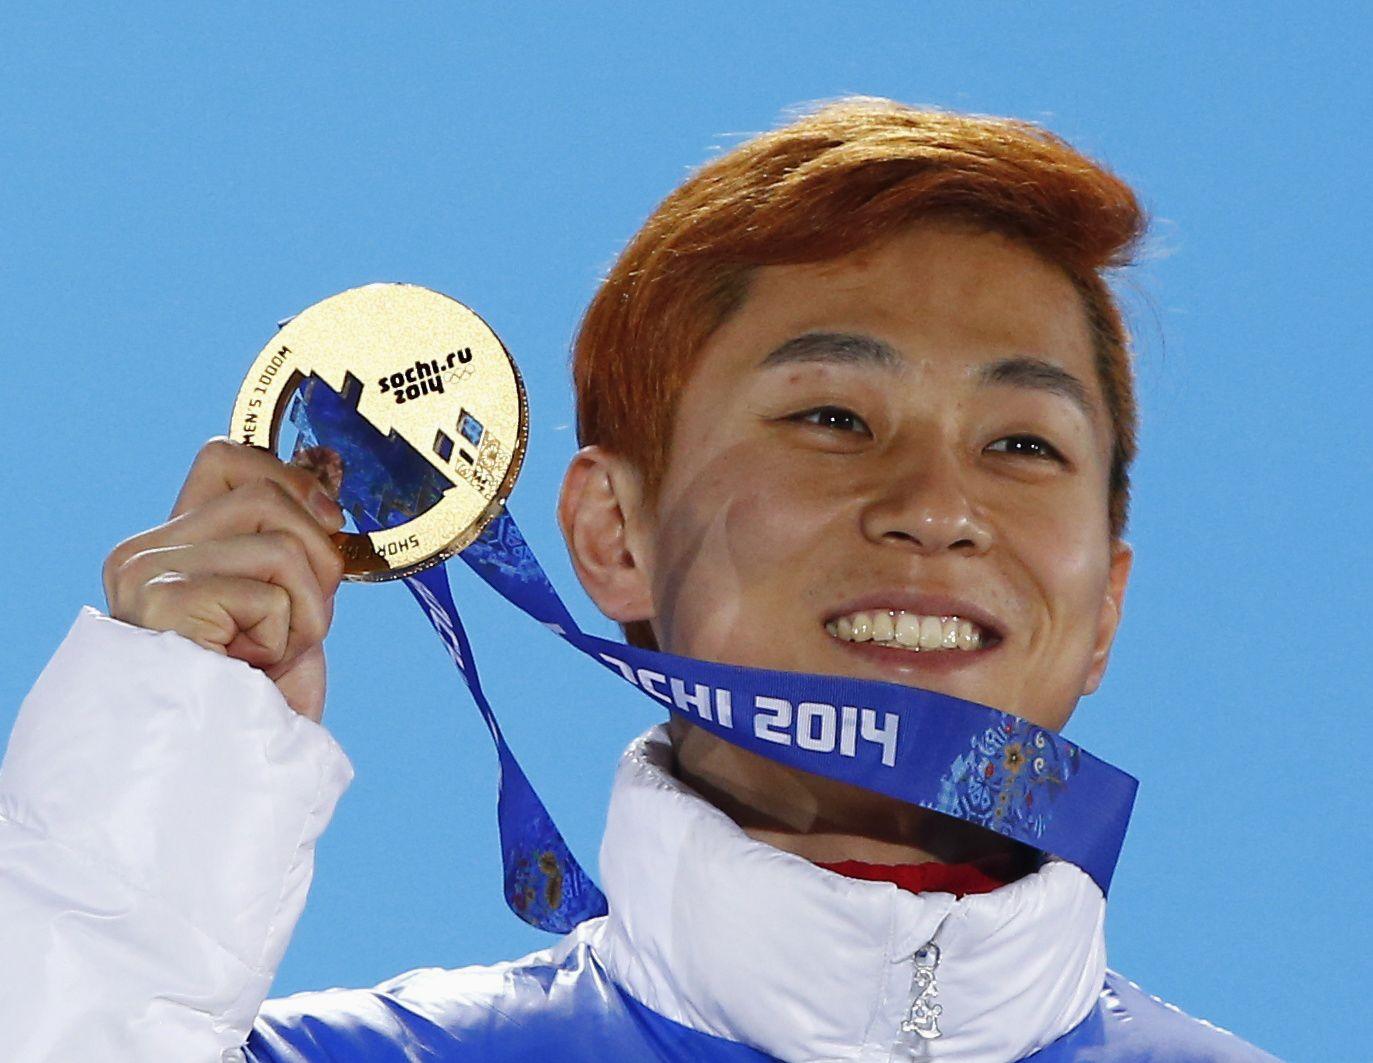 Доклад о олимпийских чемпионах россии 7529